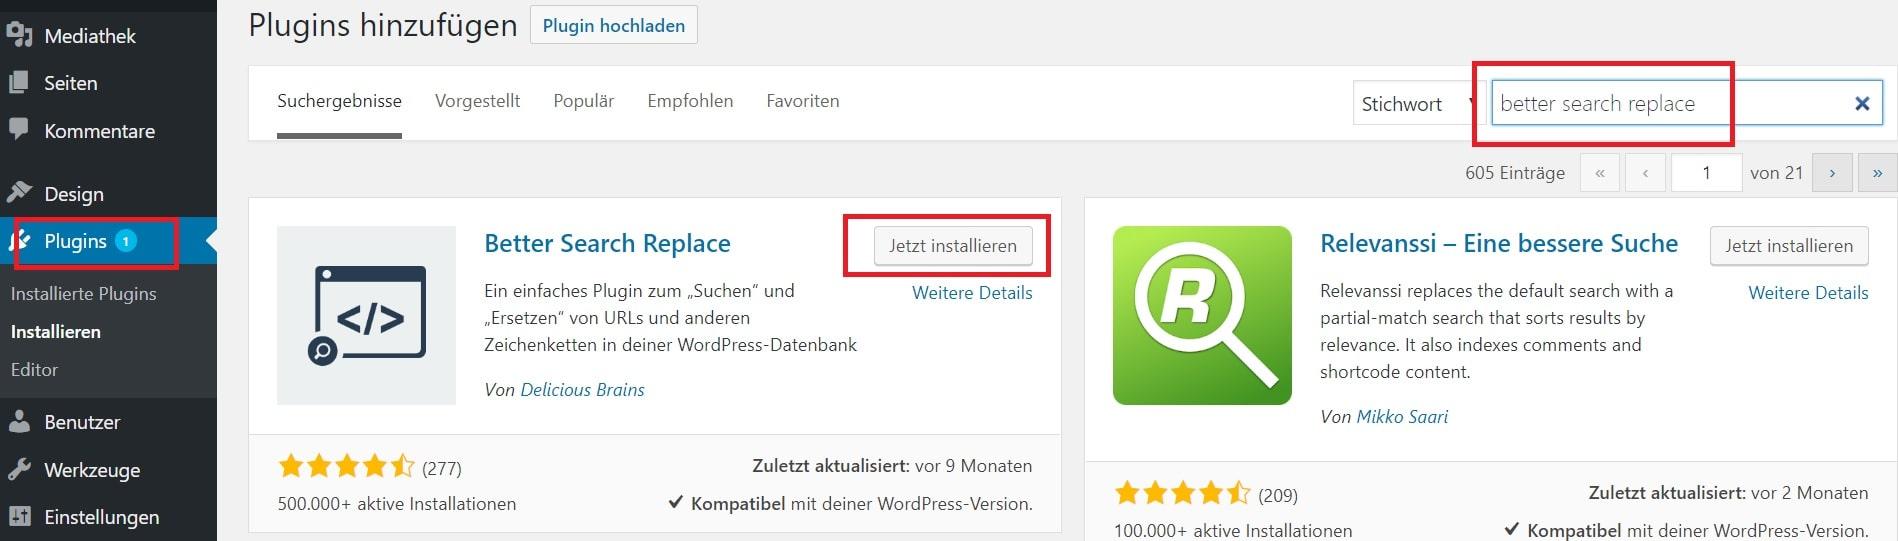 Wordpress auf HTTPS umstellen - better search replace downloaden